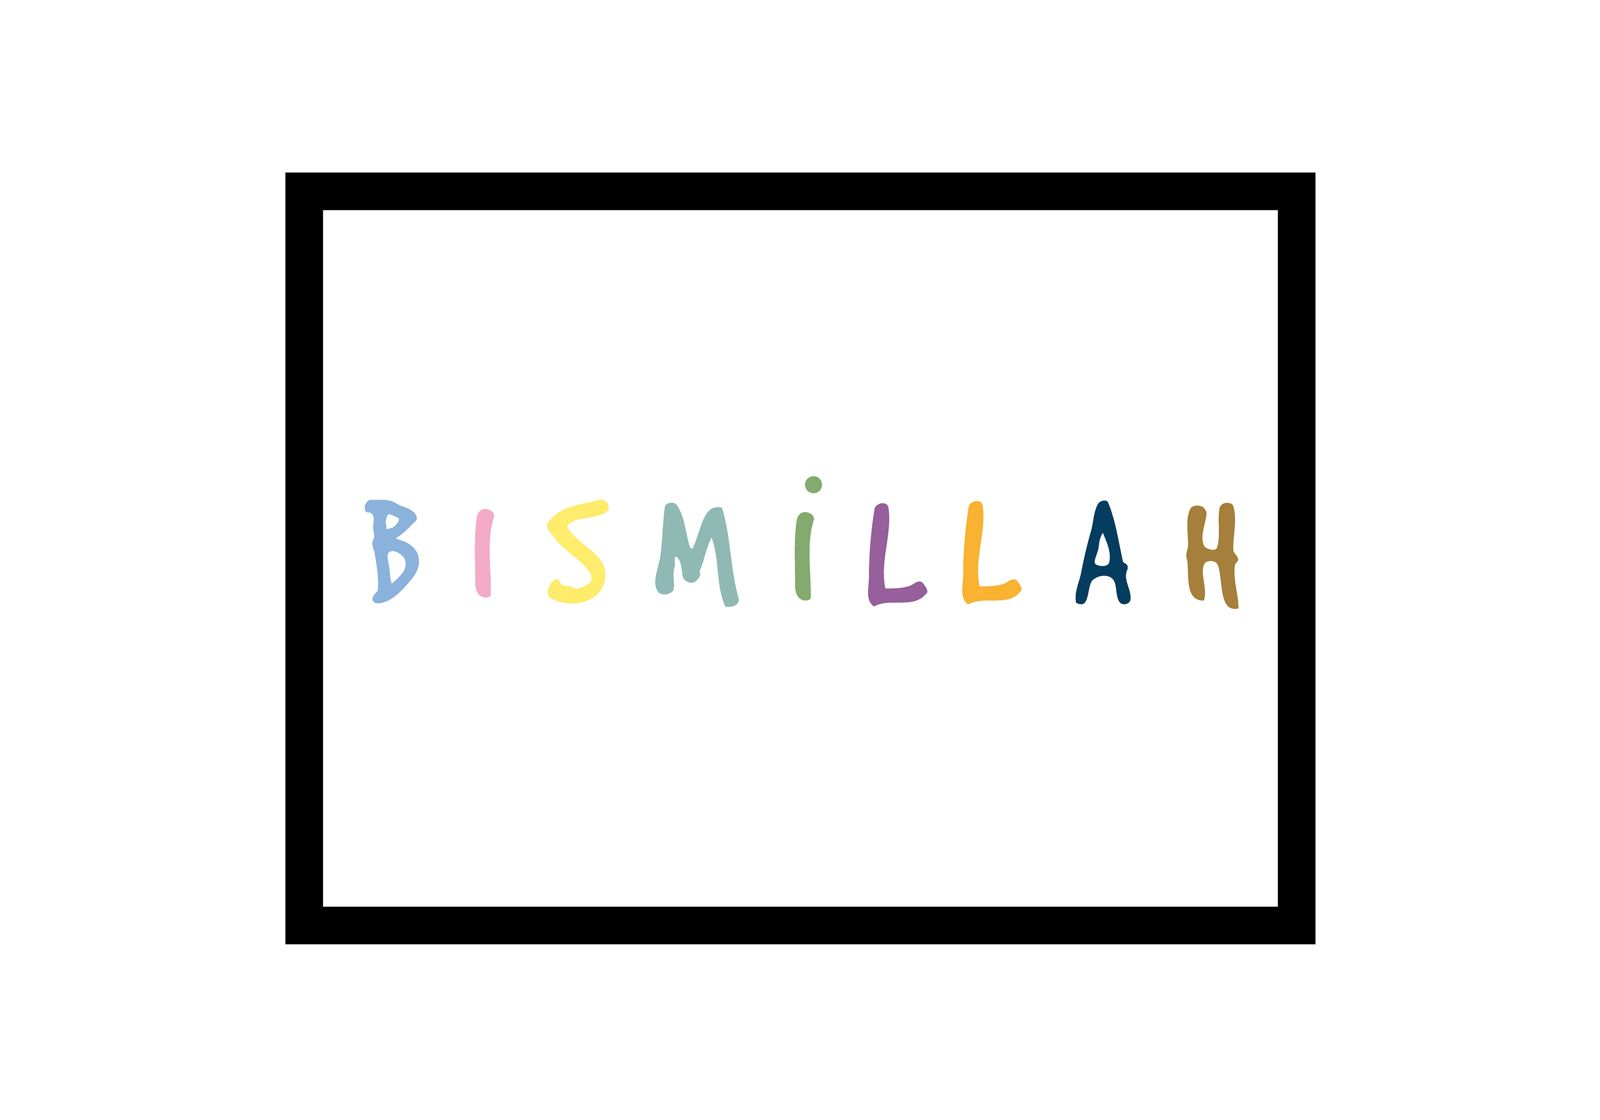 Bismillah bunt_quer_opt